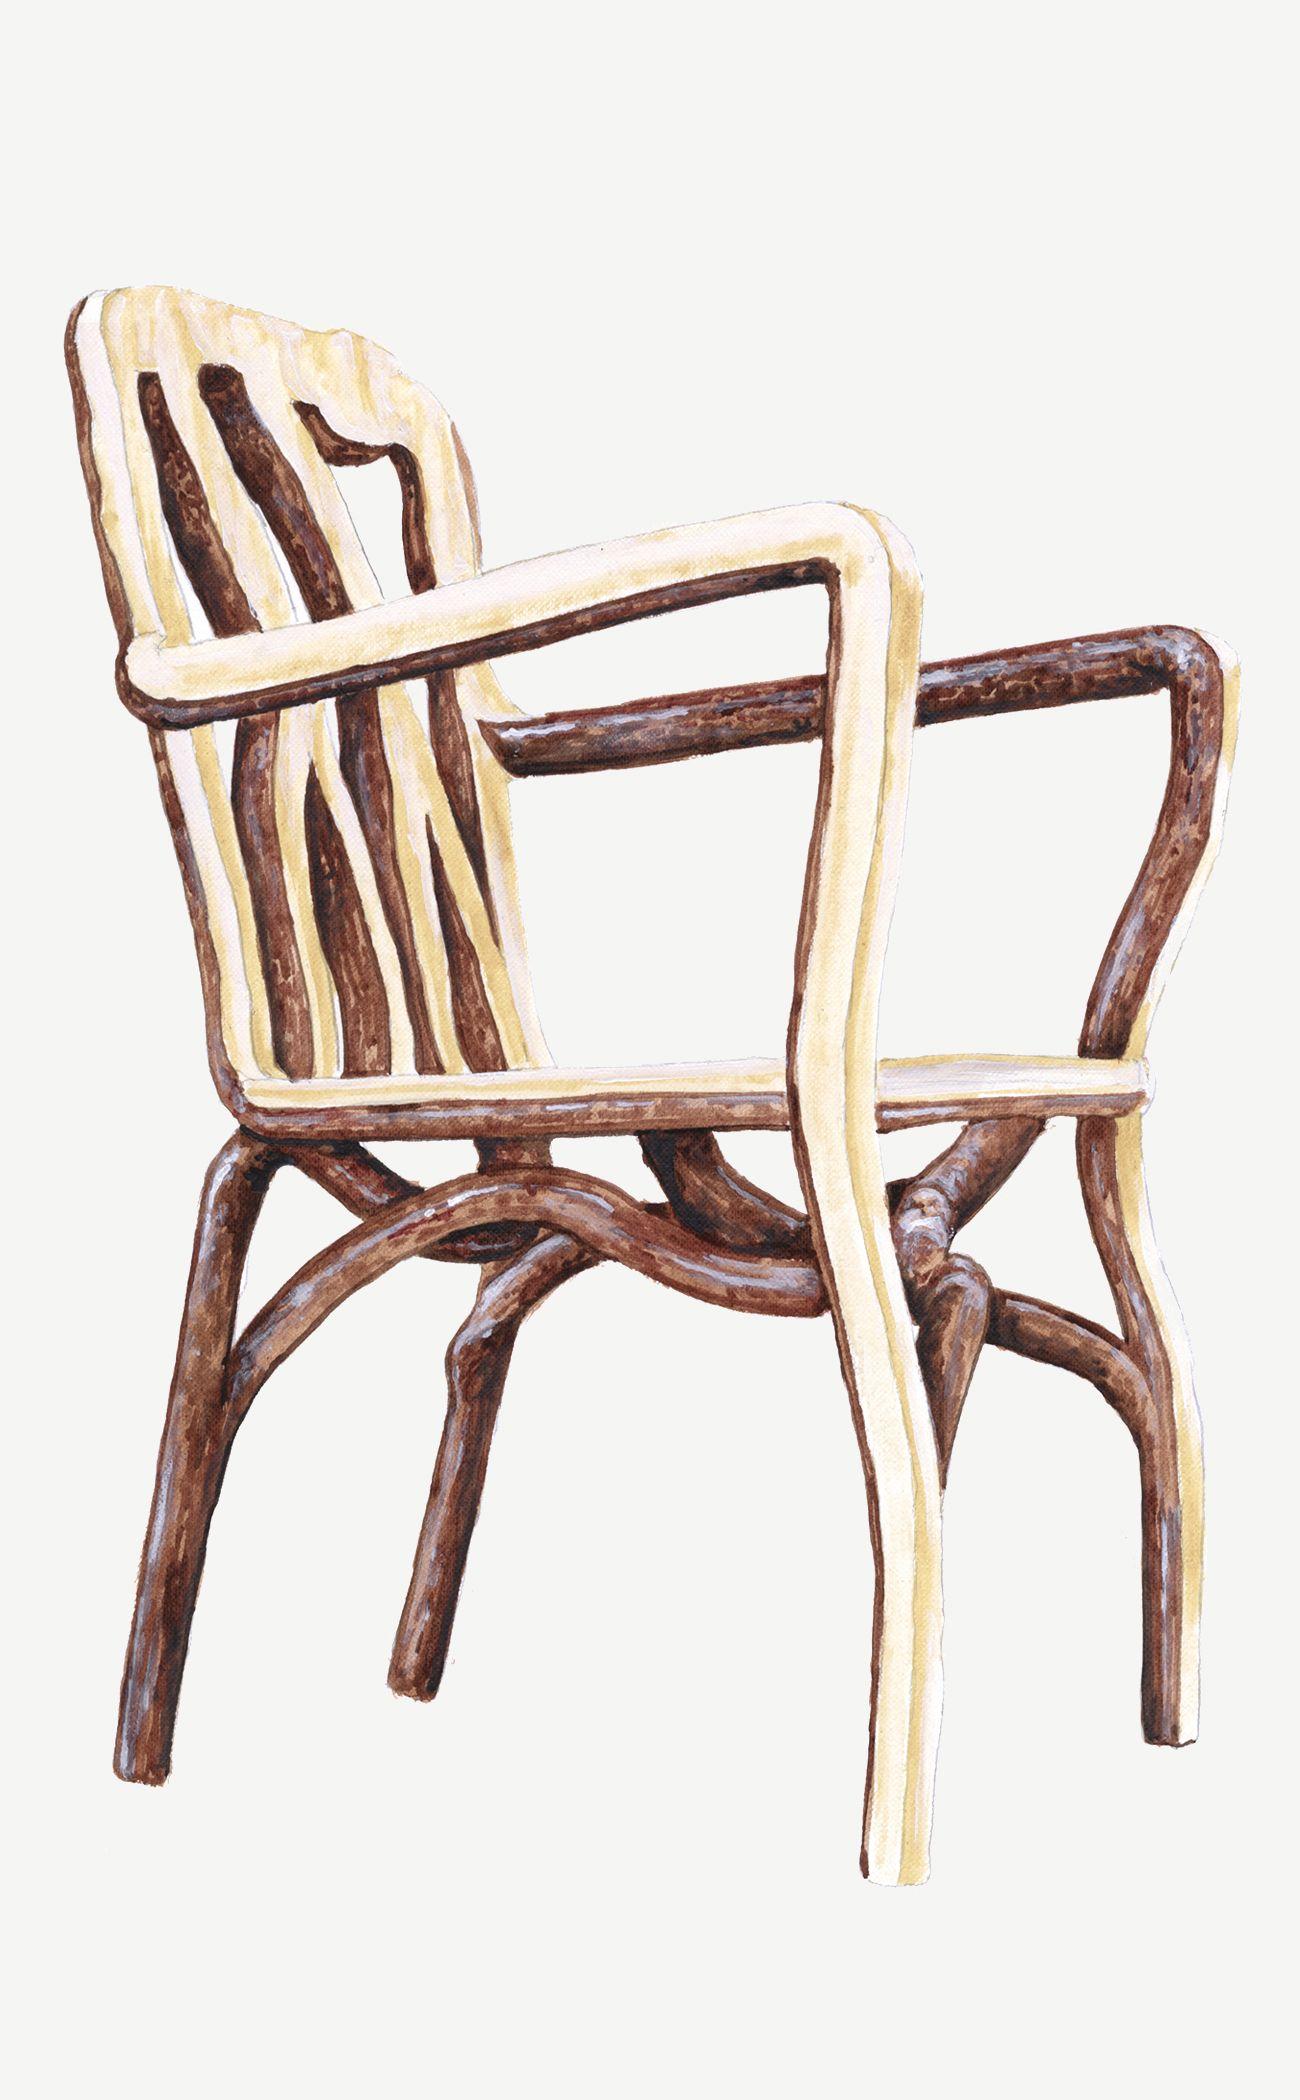 Arm Chair Full Grown Chair, Armchair, Chairs for sale